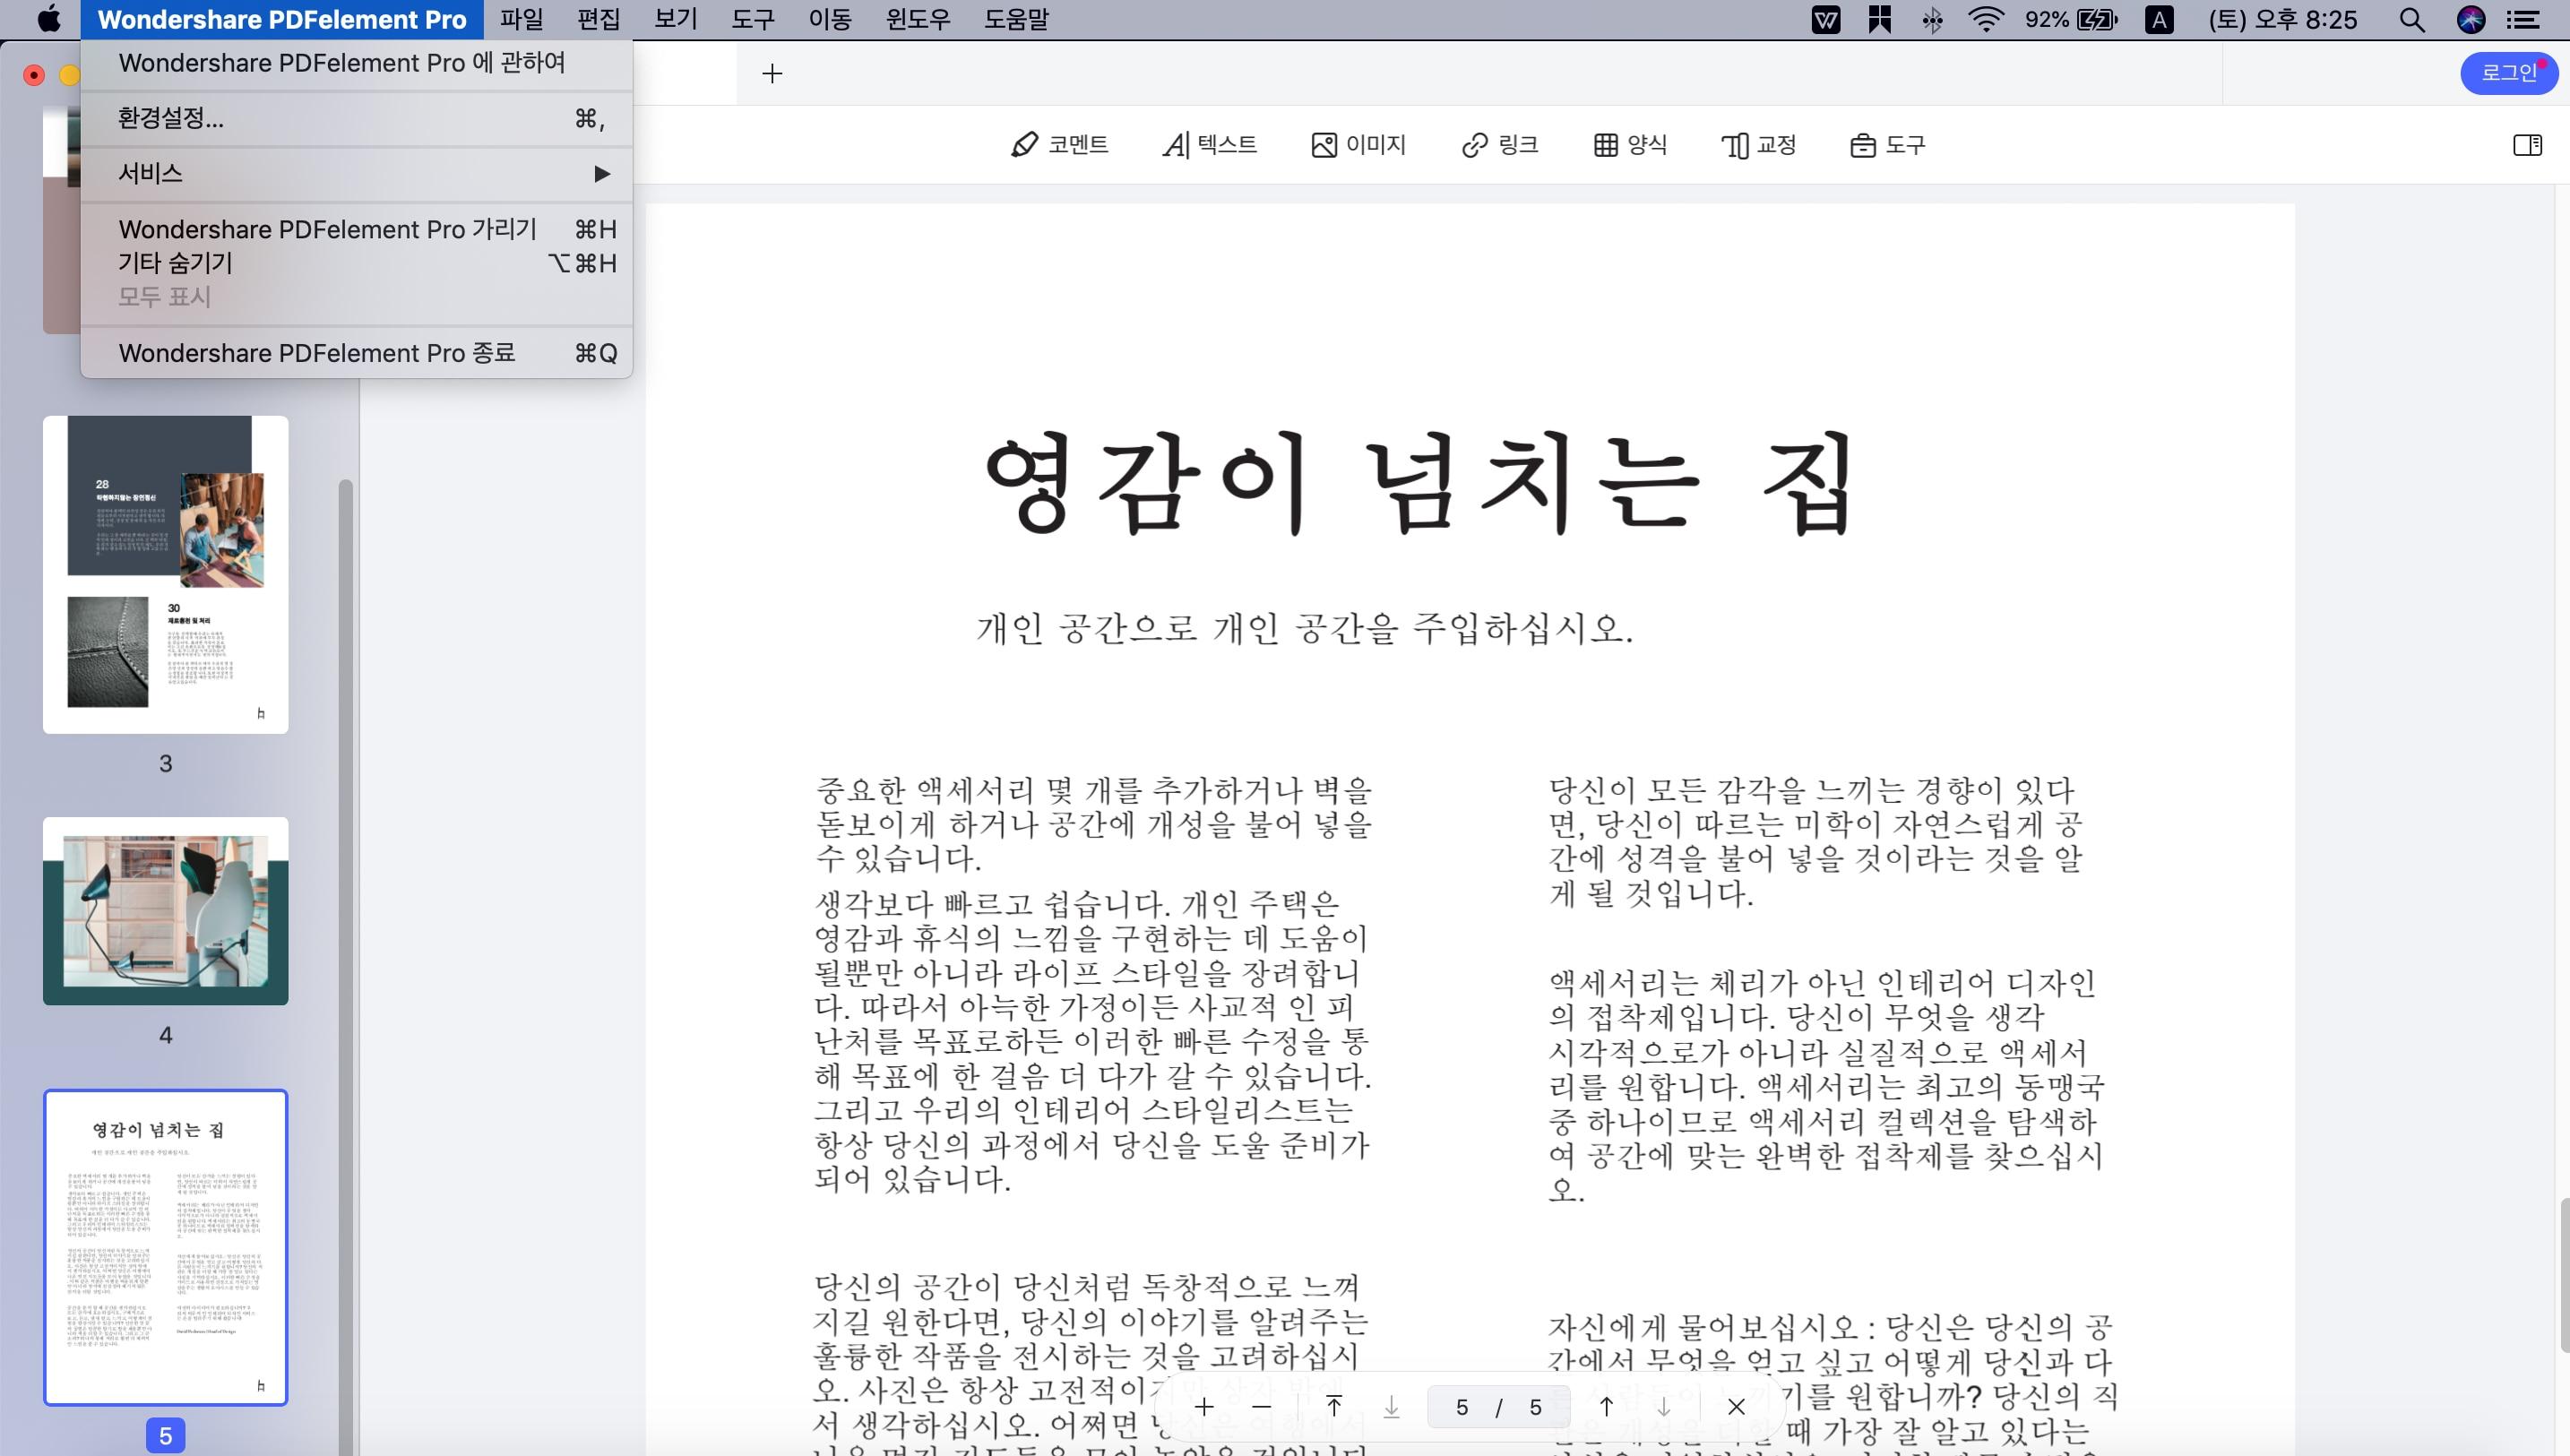 pdfelement menu